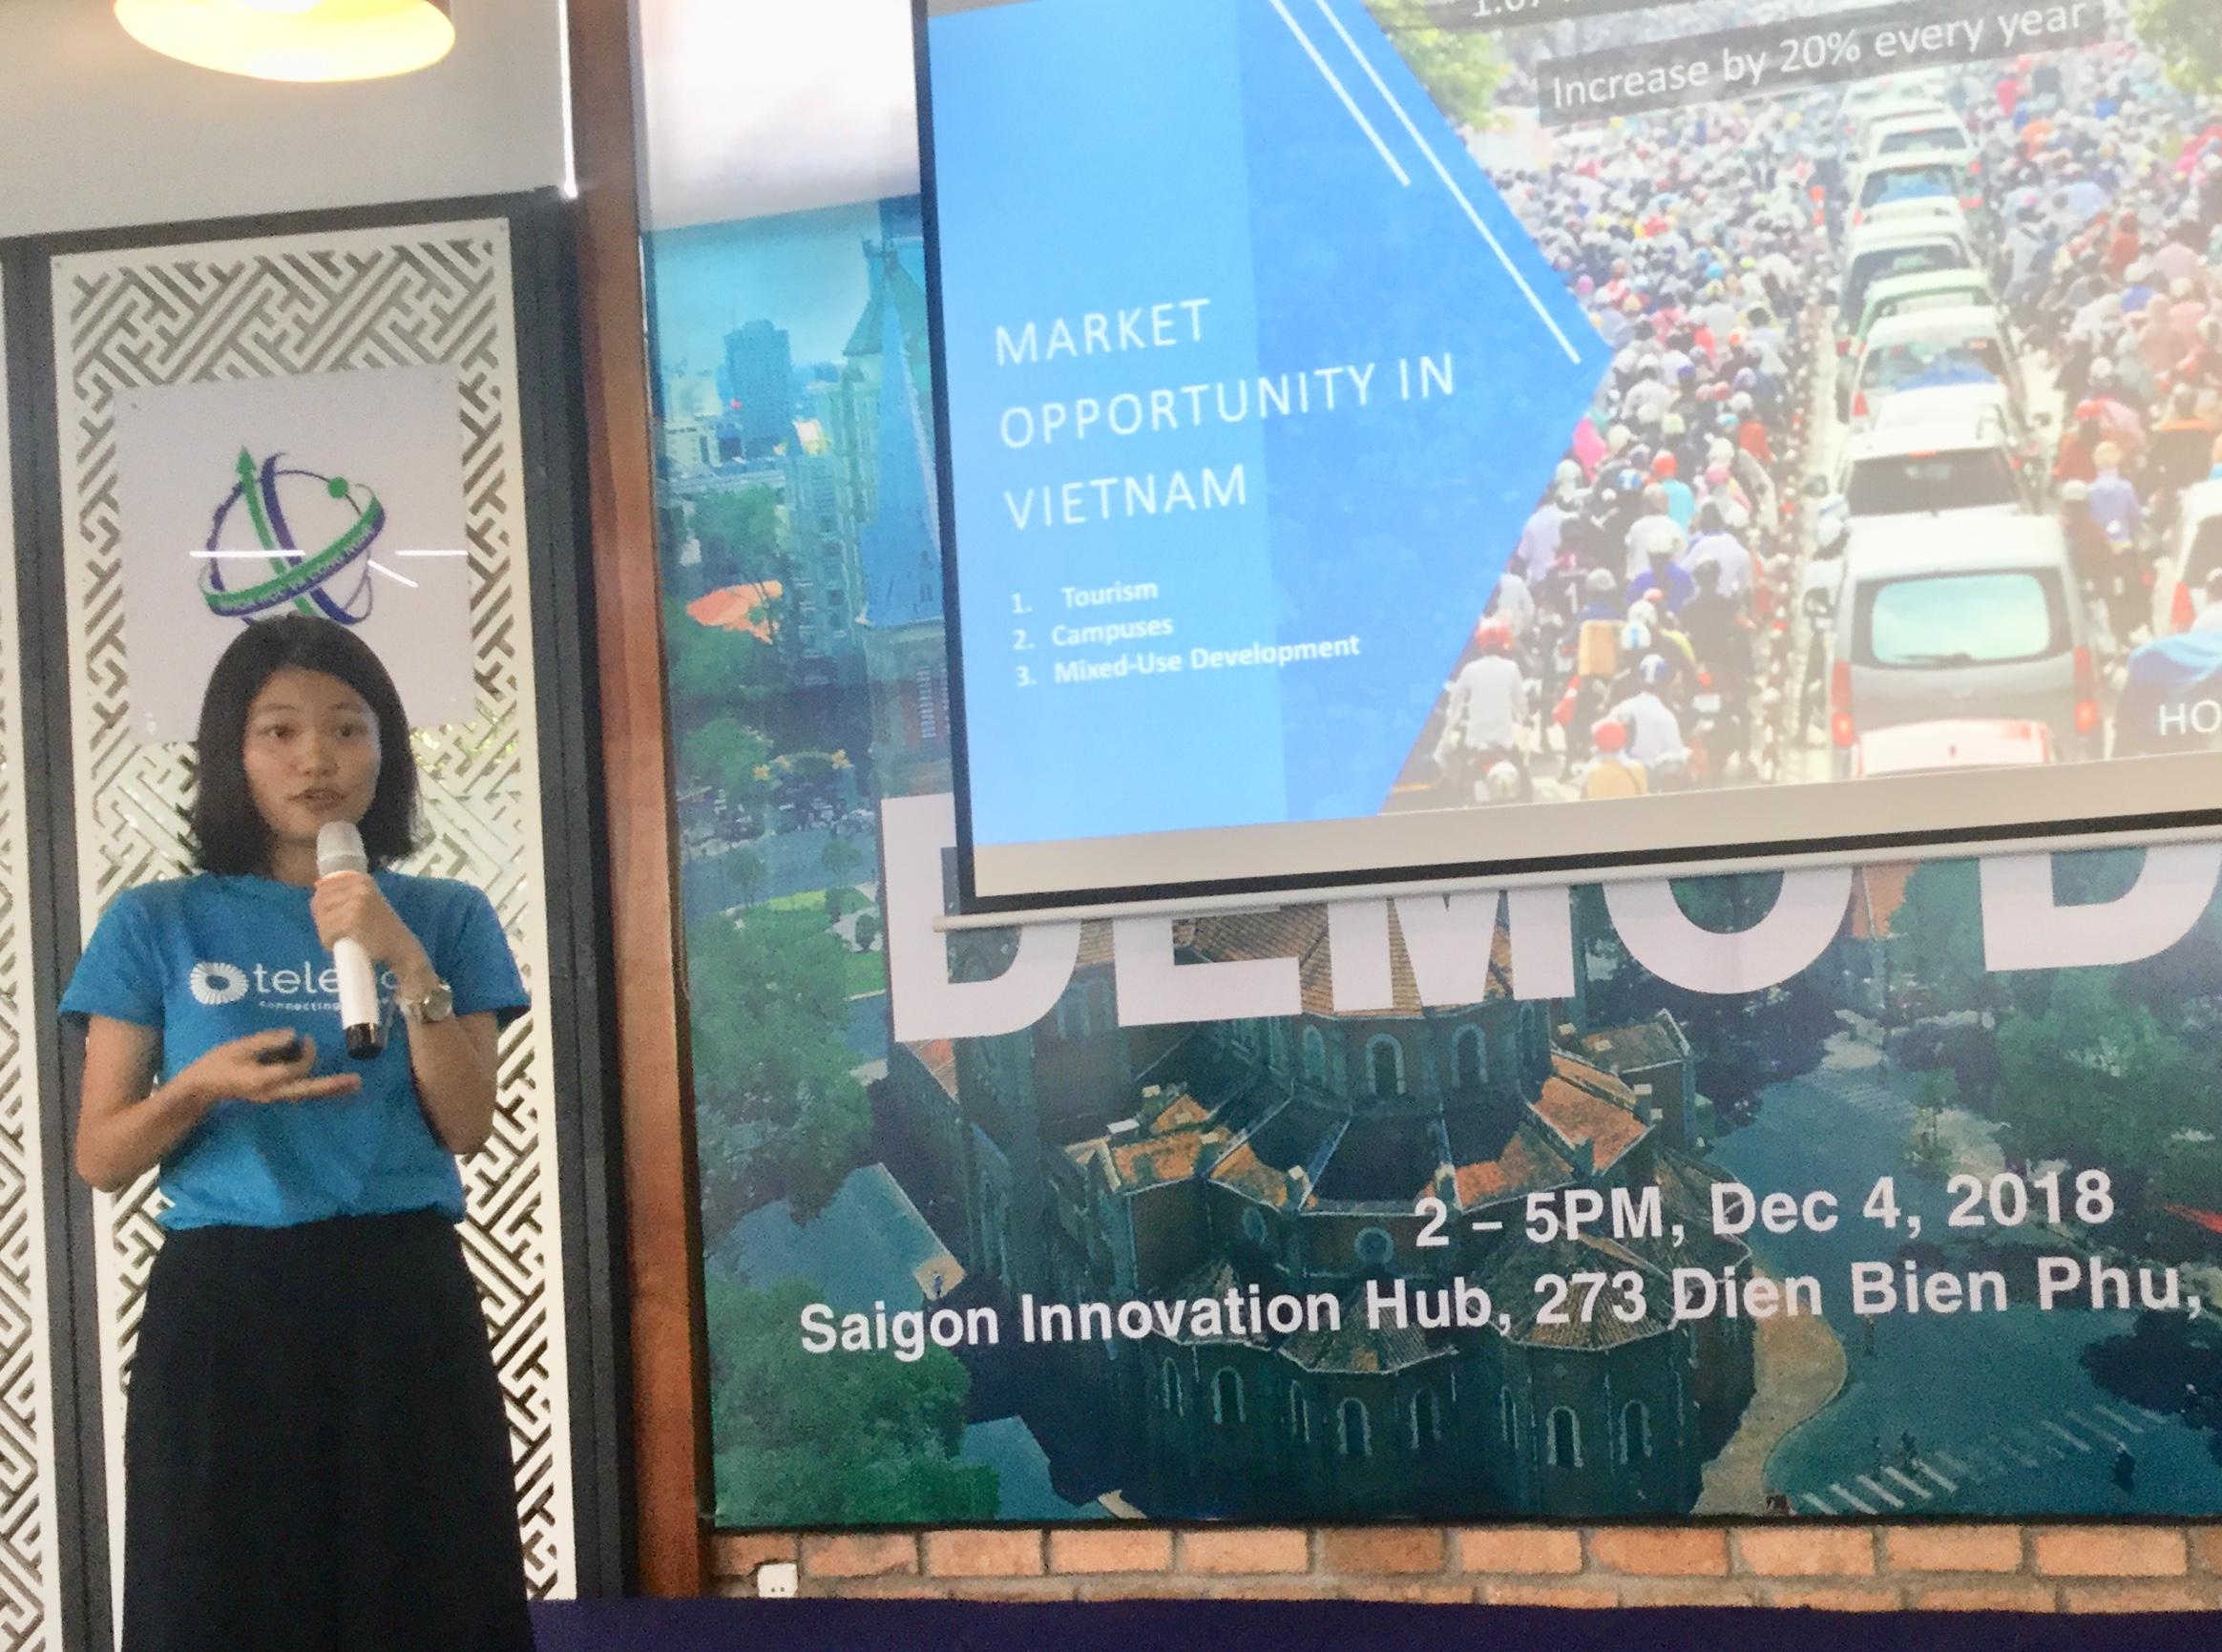 Sự kiện Saigon Innovation Hub (SIHUB)